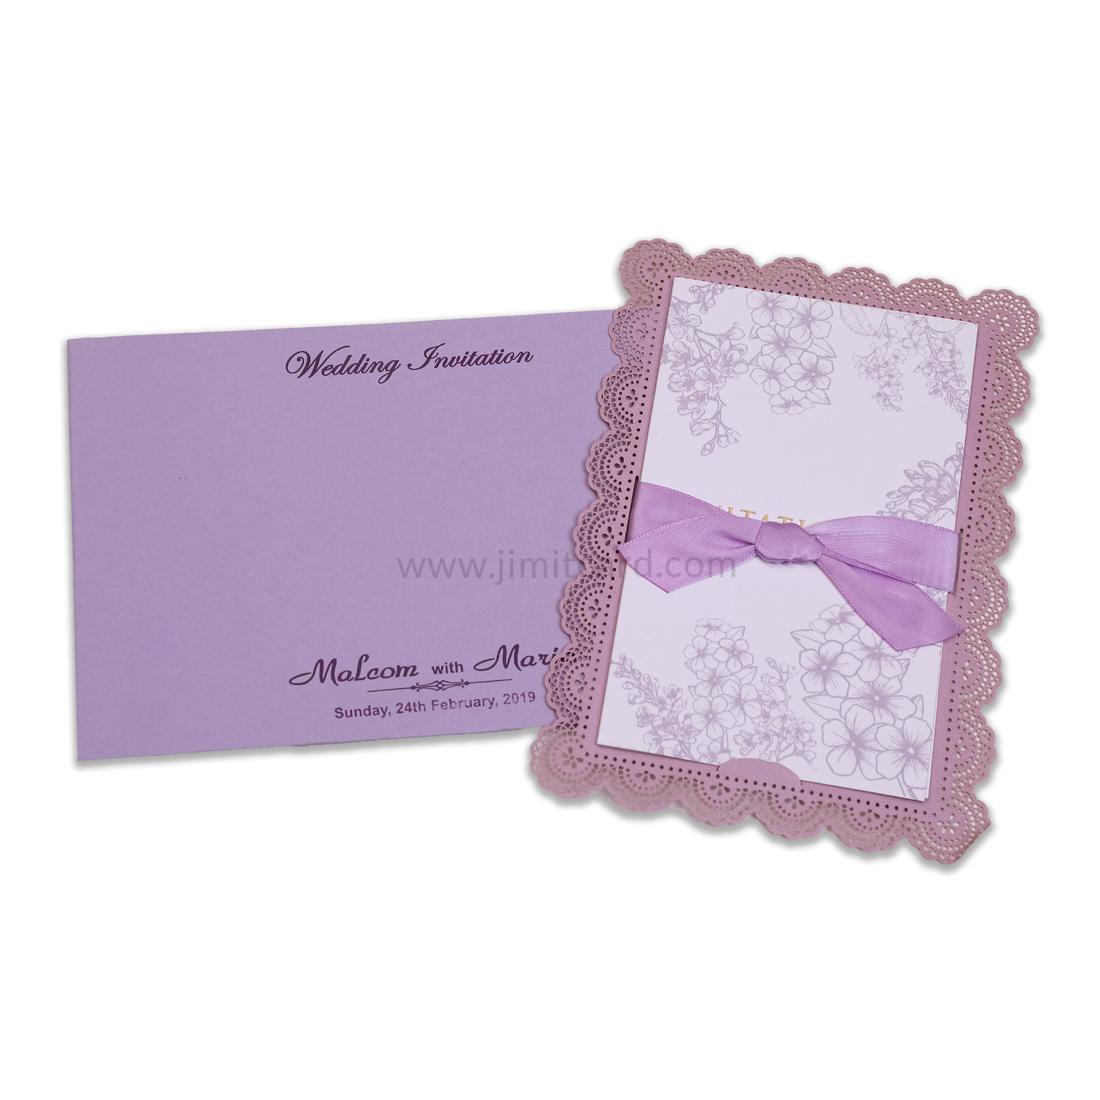 Lavender Color Wedding Card With Floral Laser cut Borders-0